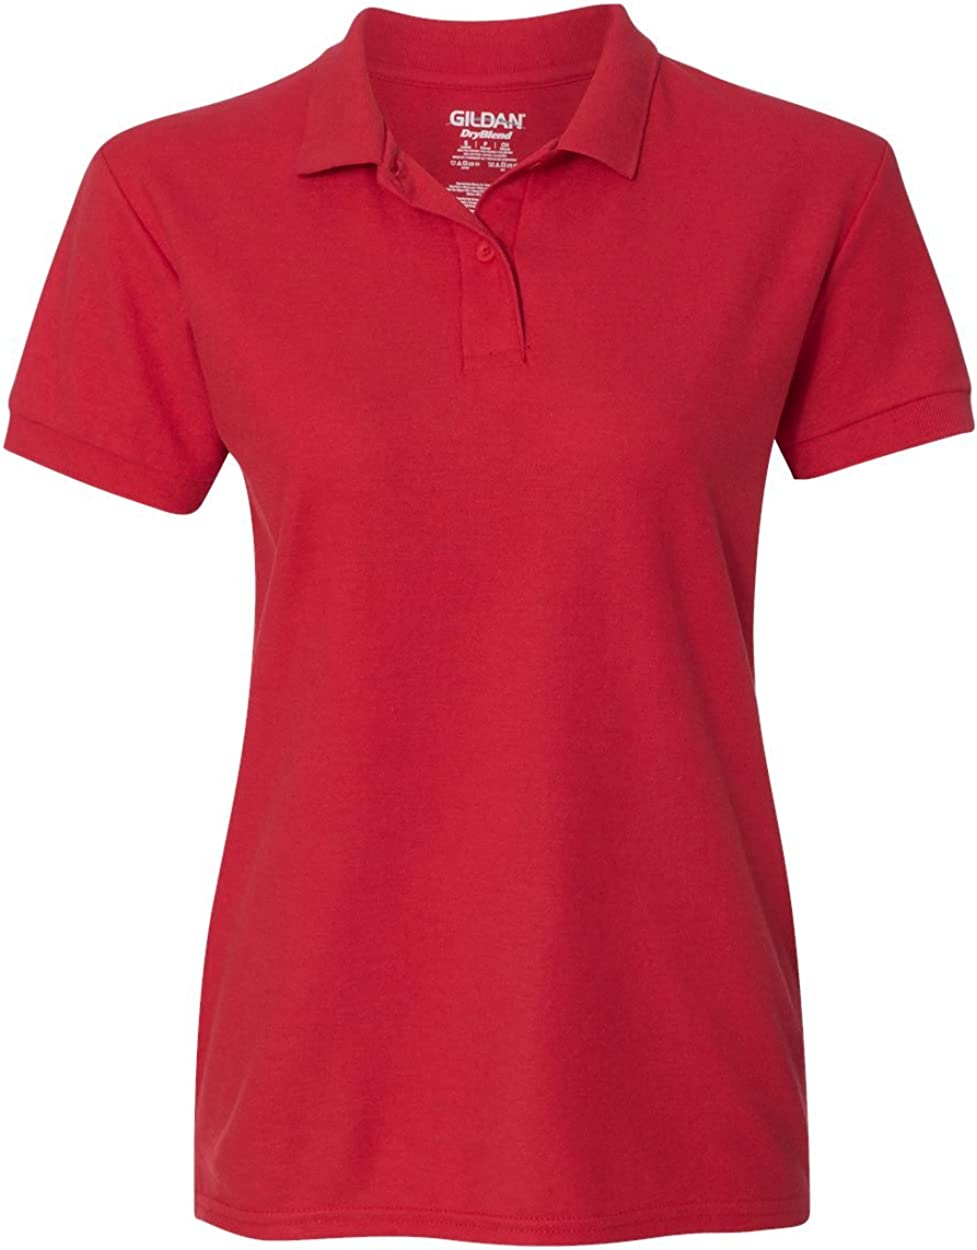 Gildan Womens DryBlend 6.3 oz. Double Piqu? Sport Shirt (G728L) -RED -L